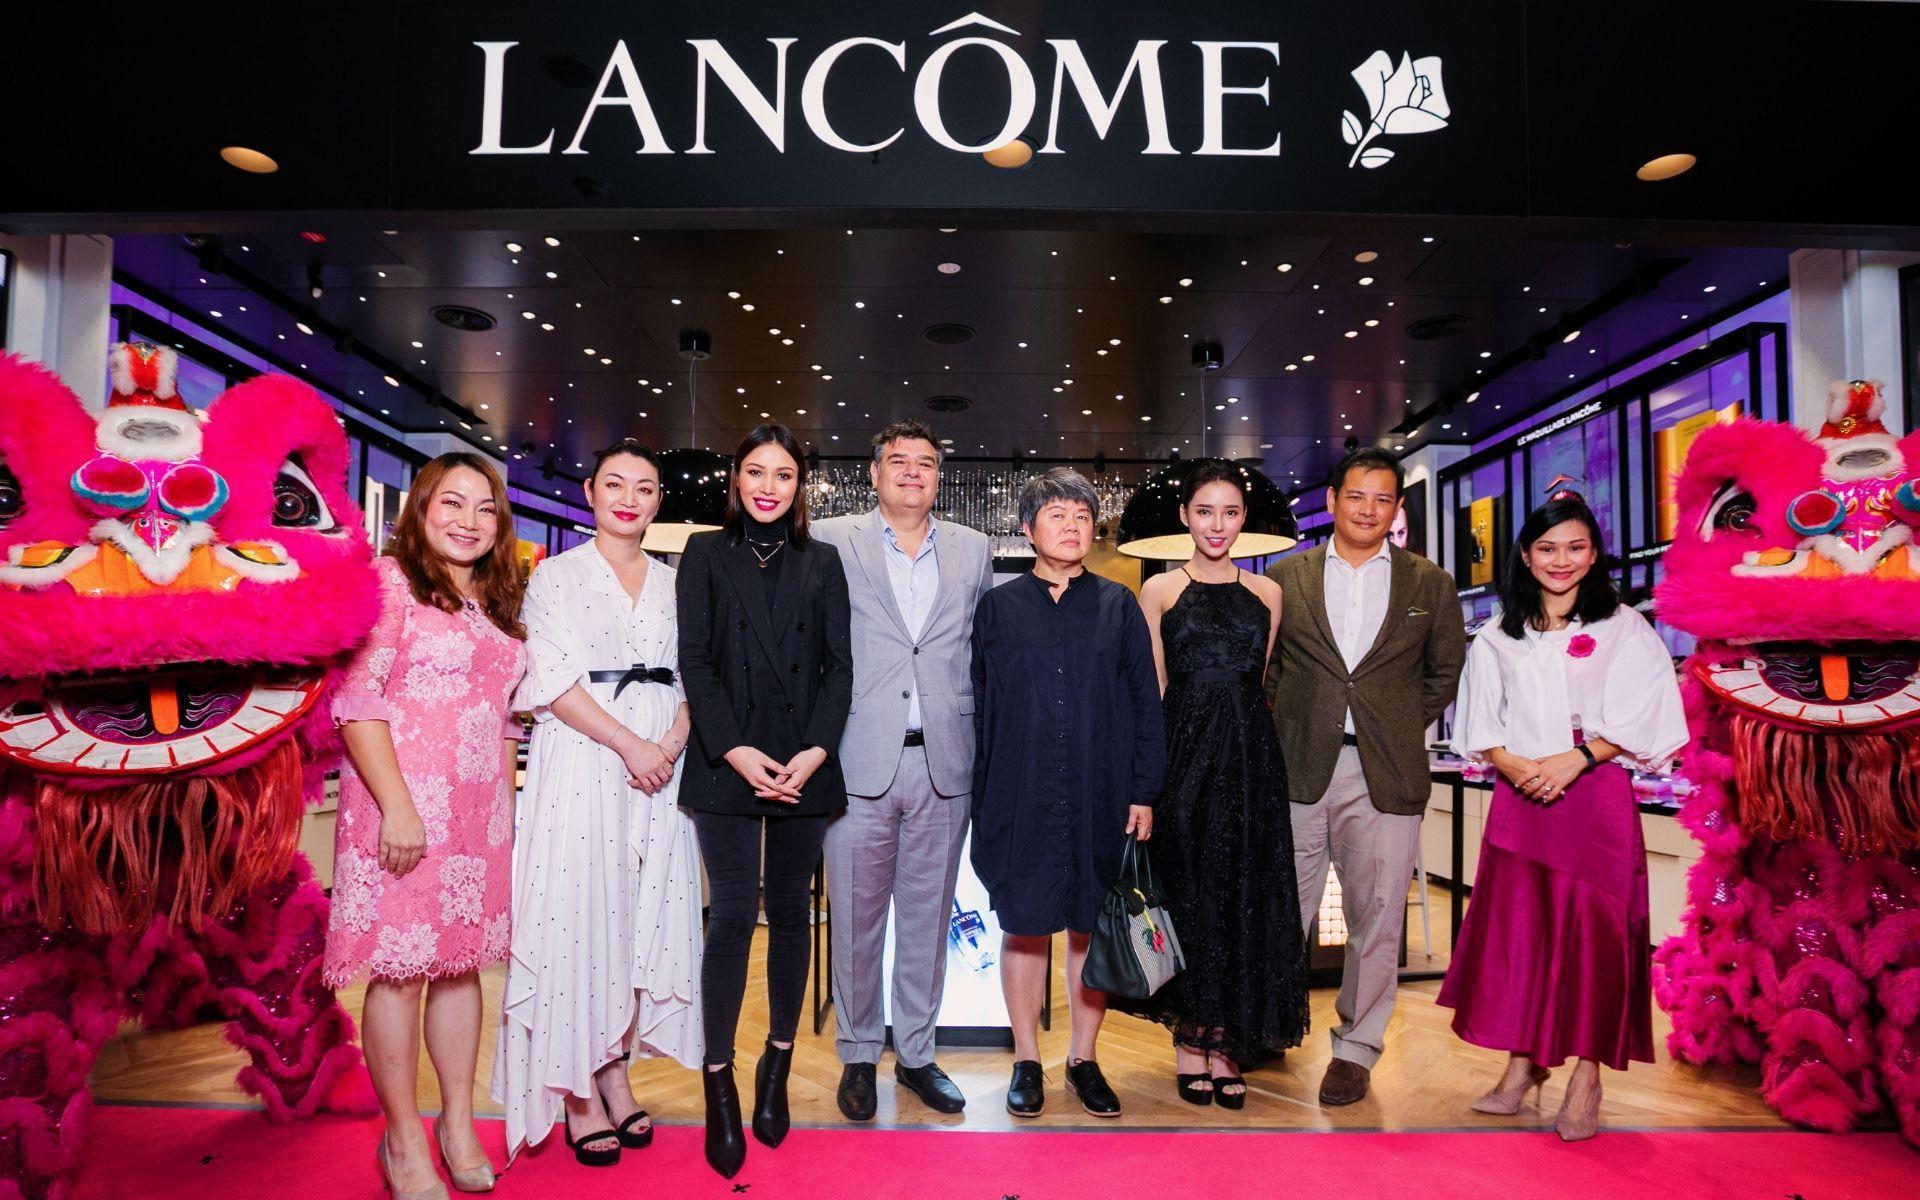 Jasmine Ku, Jennie Ma, Zahirah Macwilson, Malek Bekdache, Rennie Lee, Venice Min, Daniel Yong and Chua Sher Le